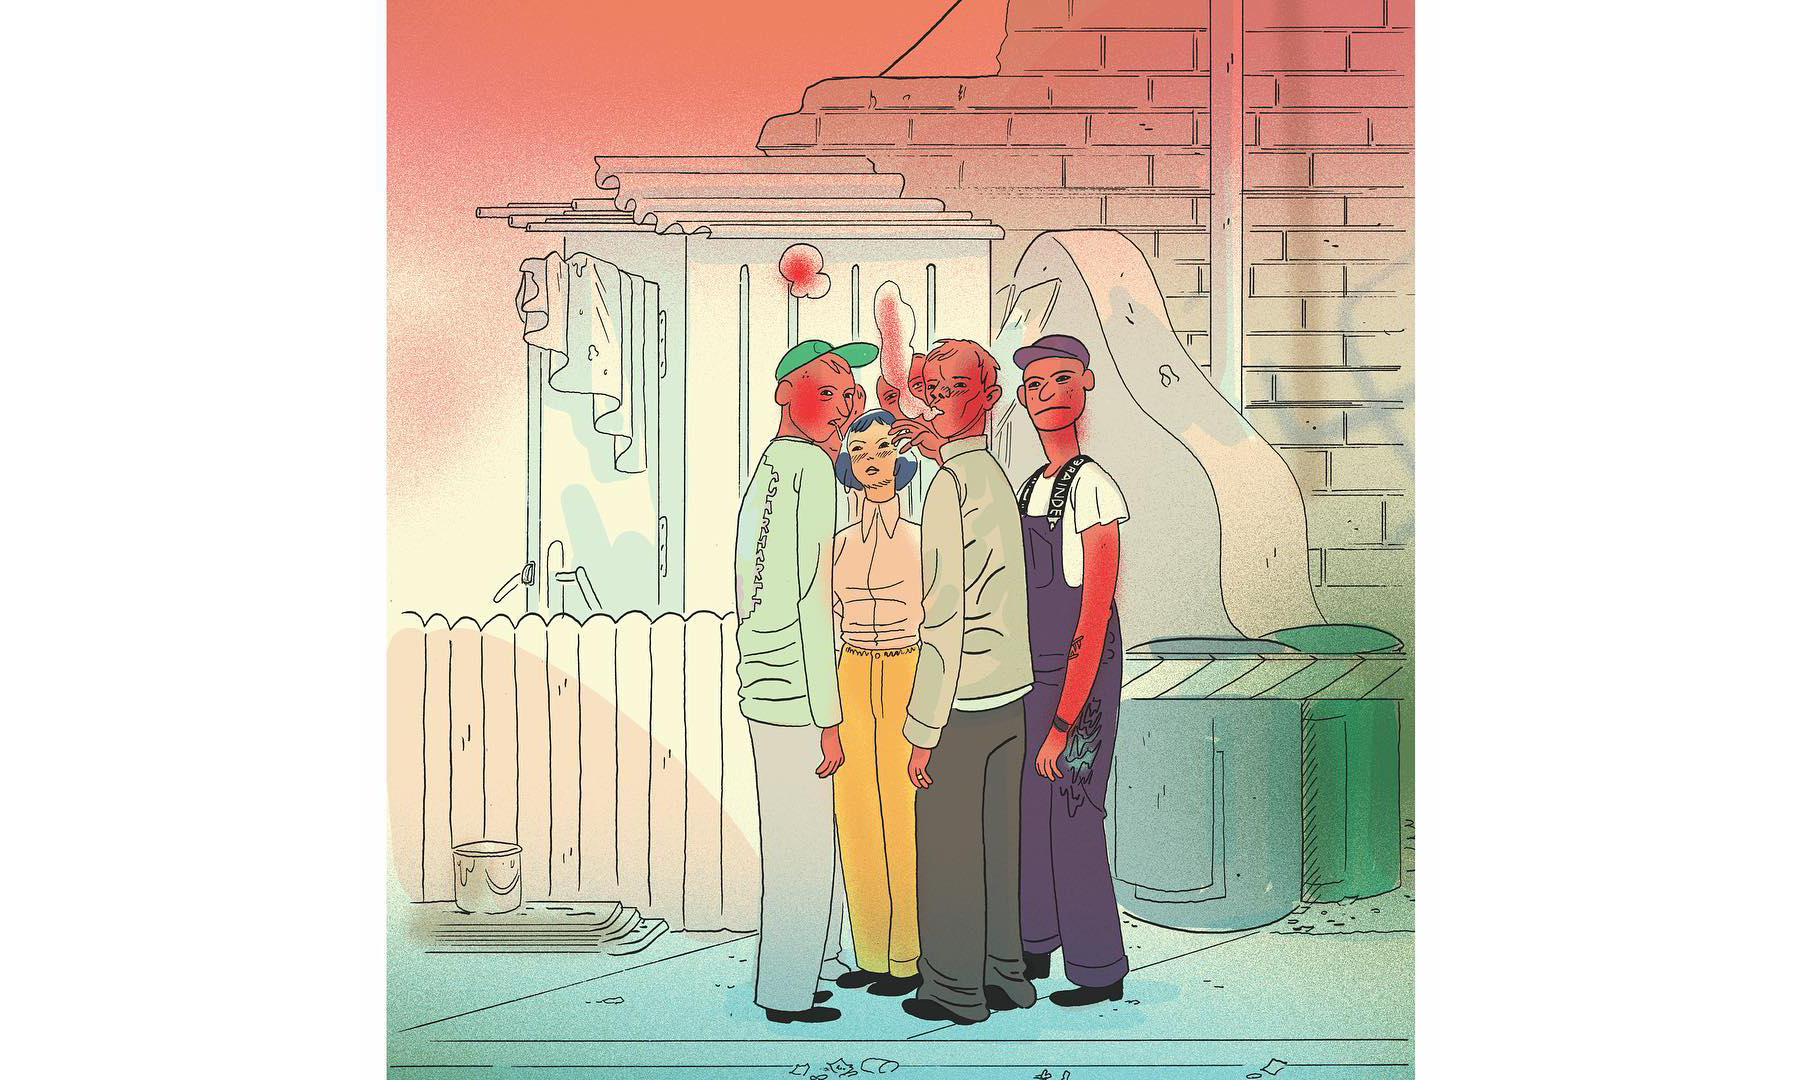 Carhartt WIP x BRAIN DEAD 用漫画呈现最新联名预告